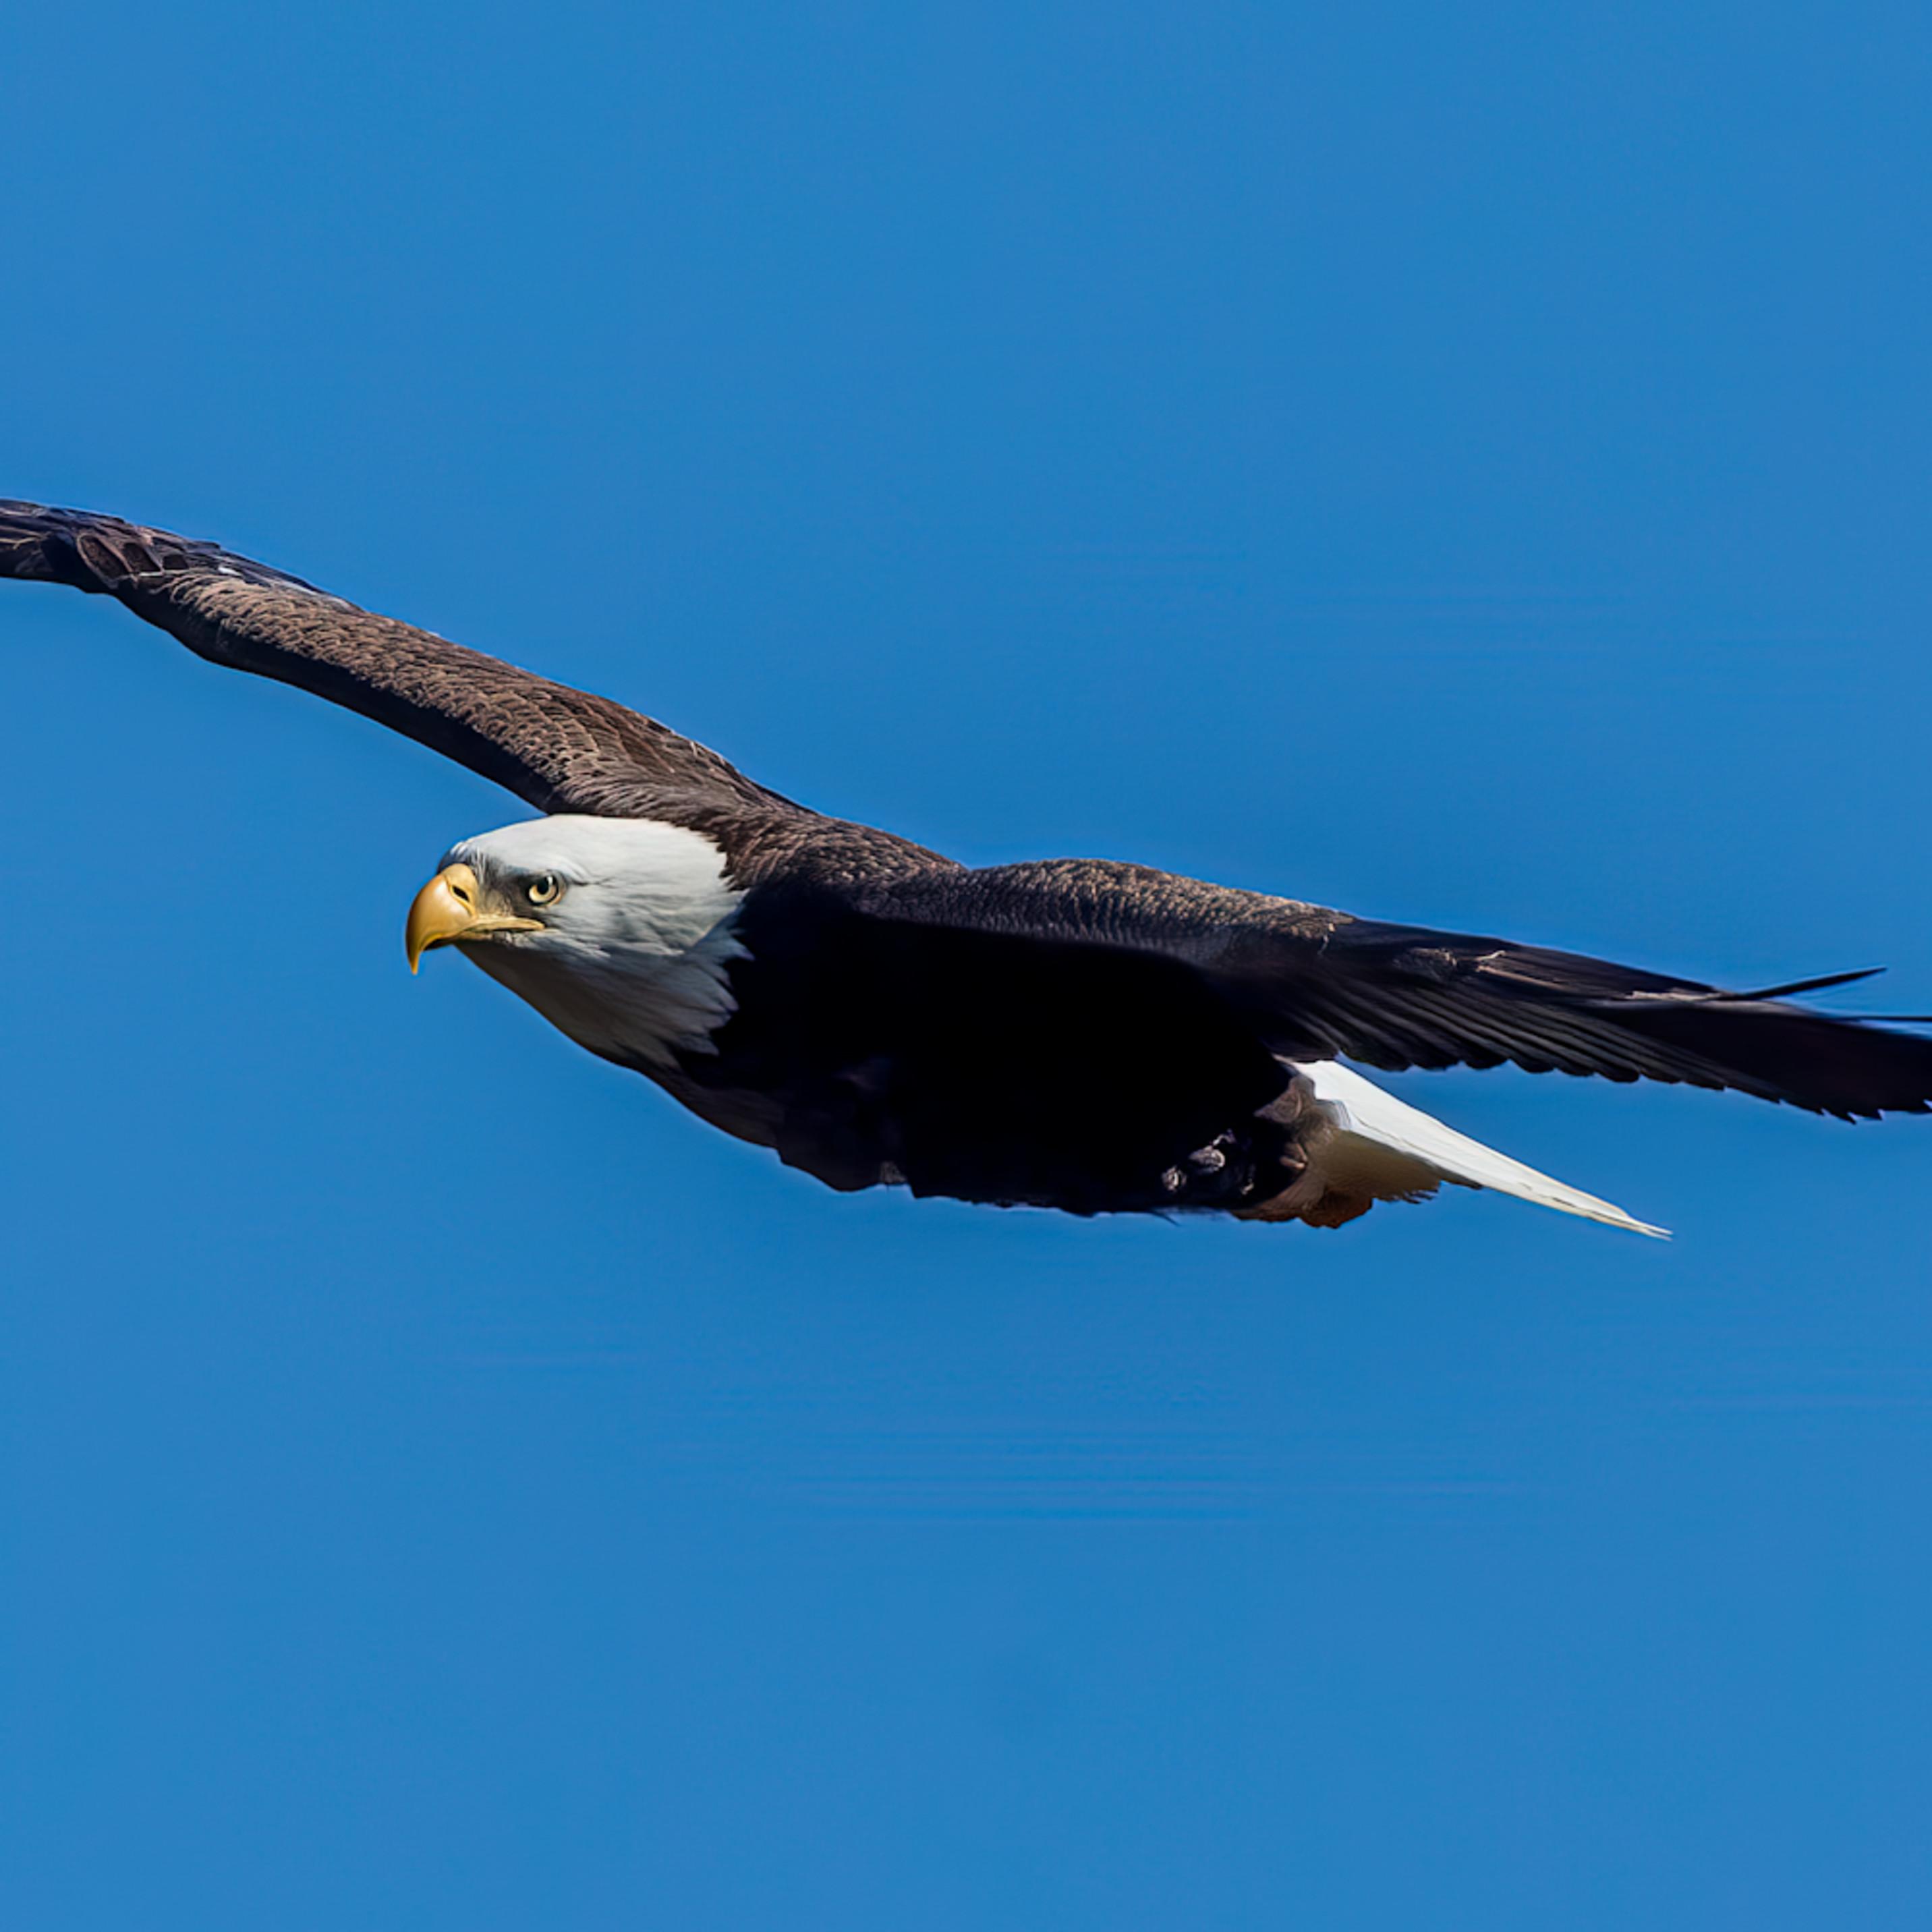 Soaring bald eagle bkfeq0